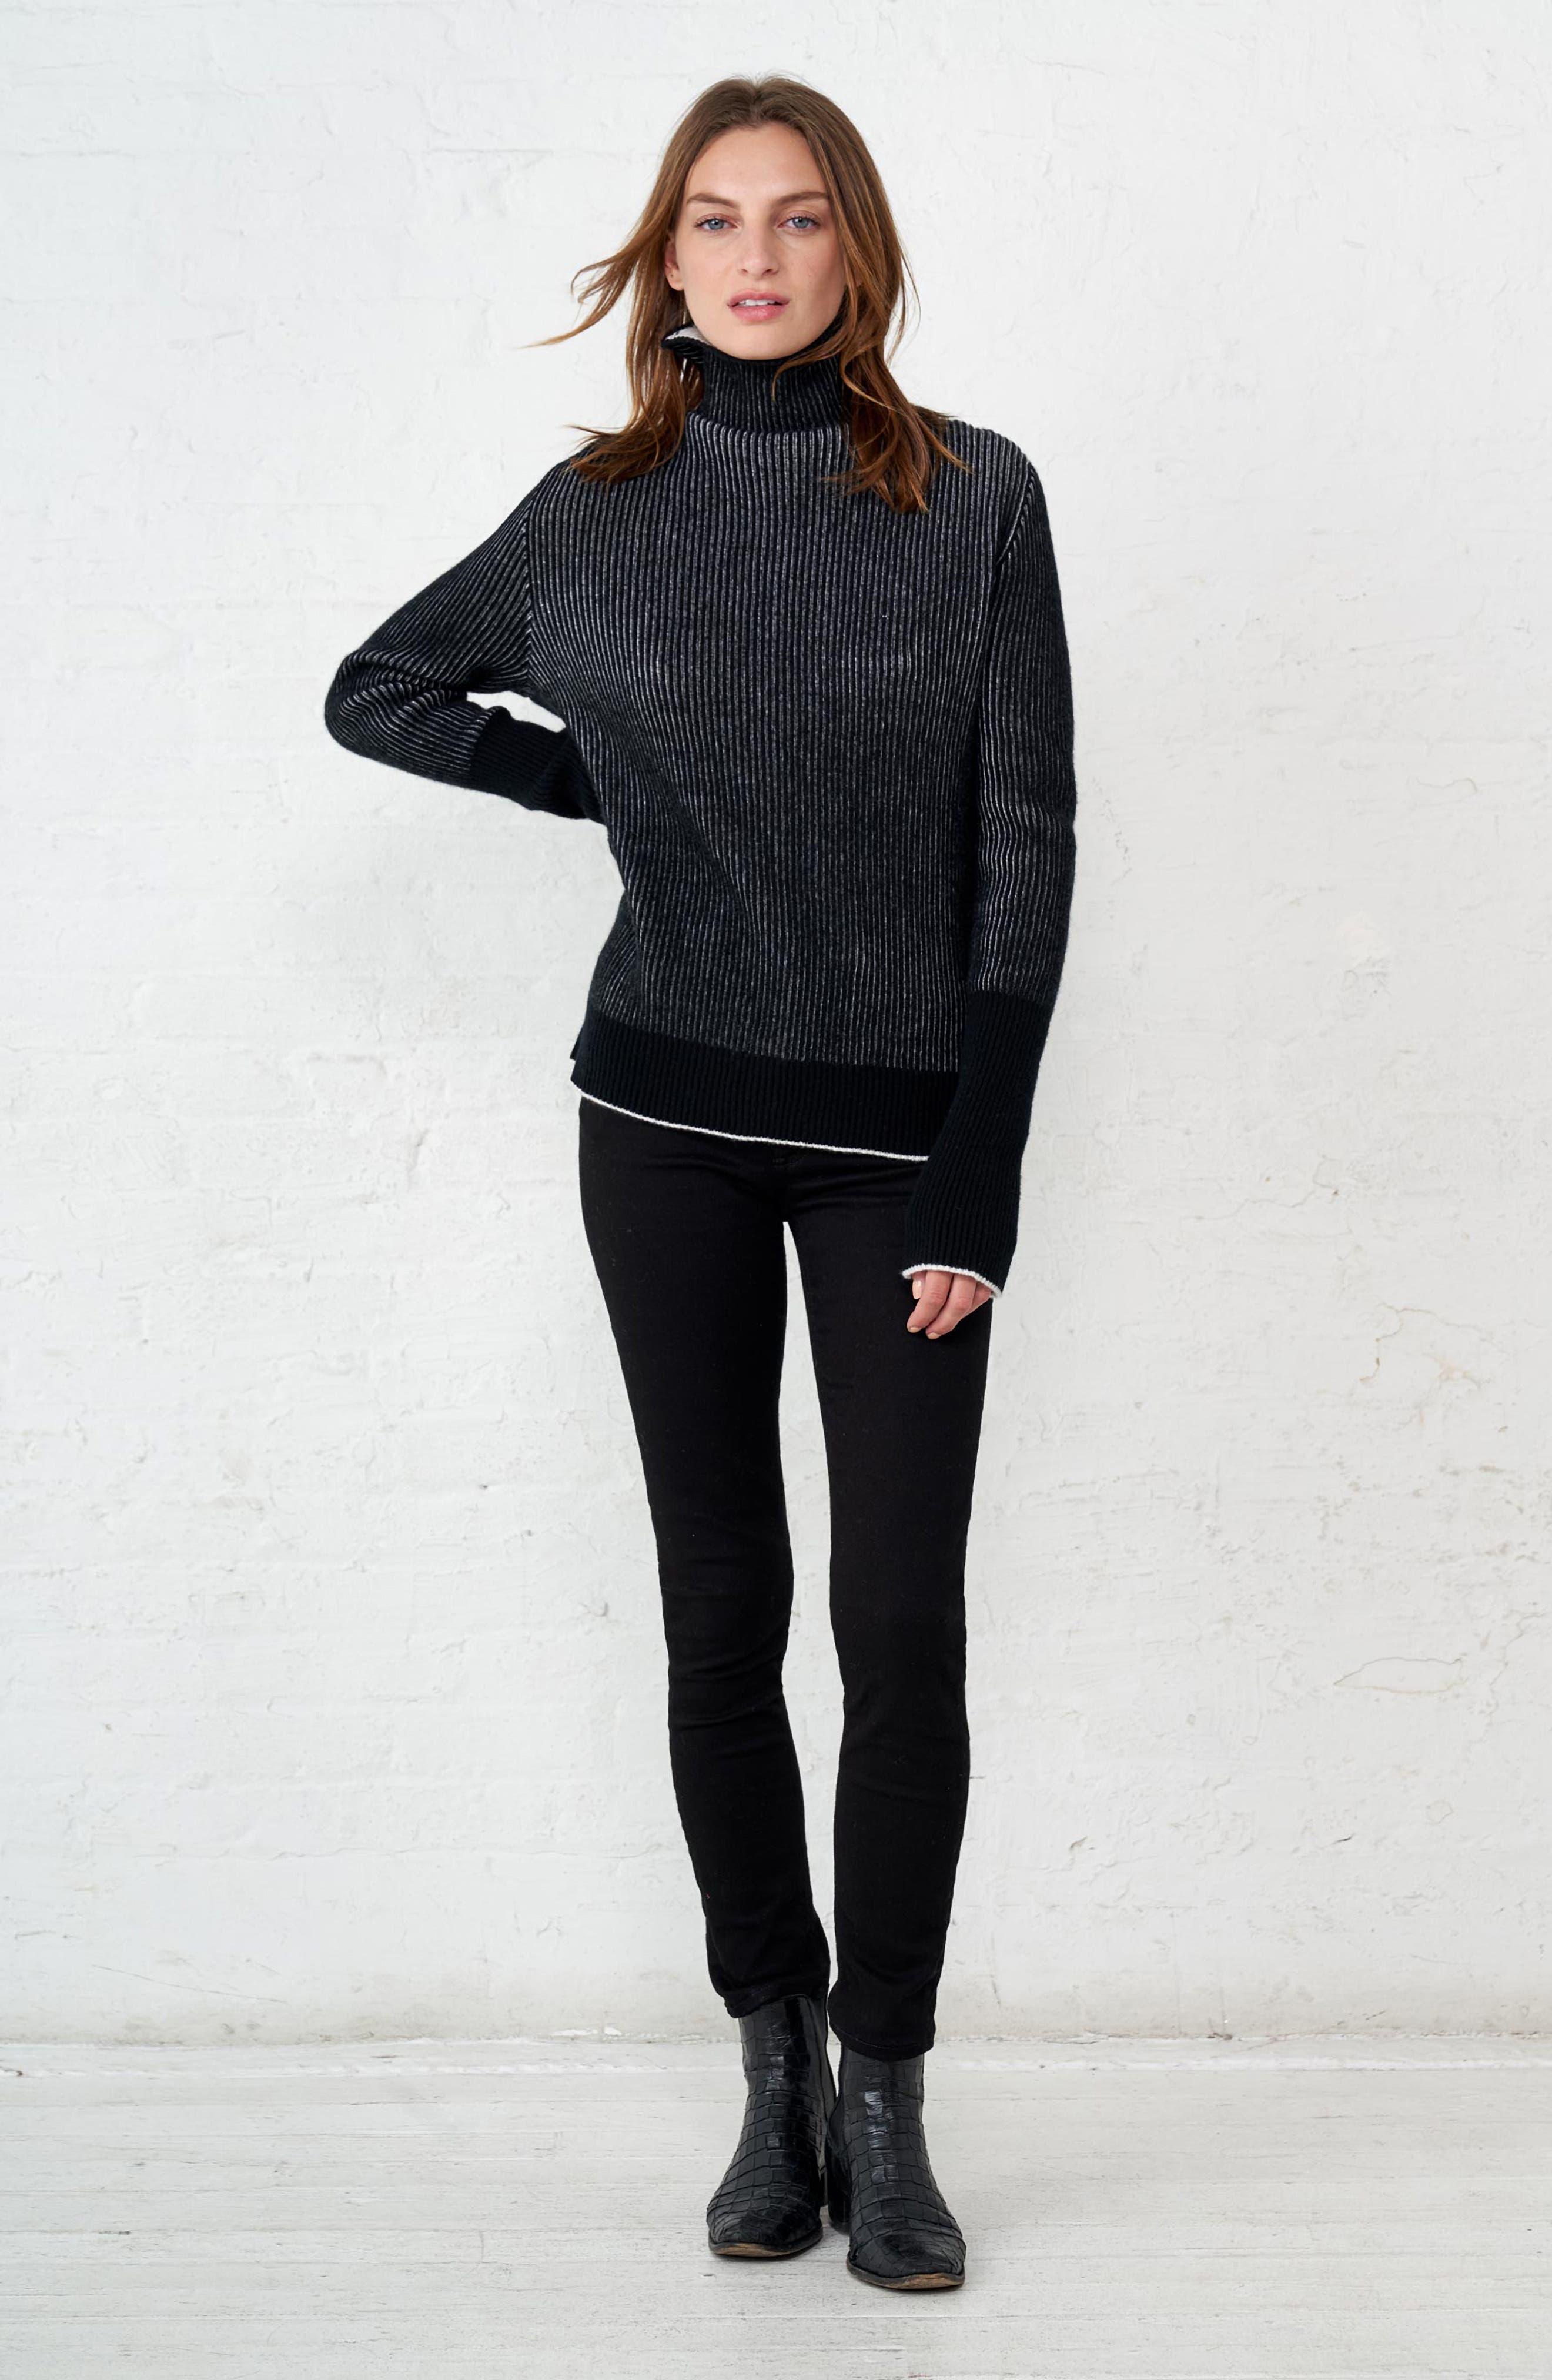 AAA Turtleneck Cashmere Sweater,                             Alternate thumbnail 8, color,                             BLACK/ CREAM